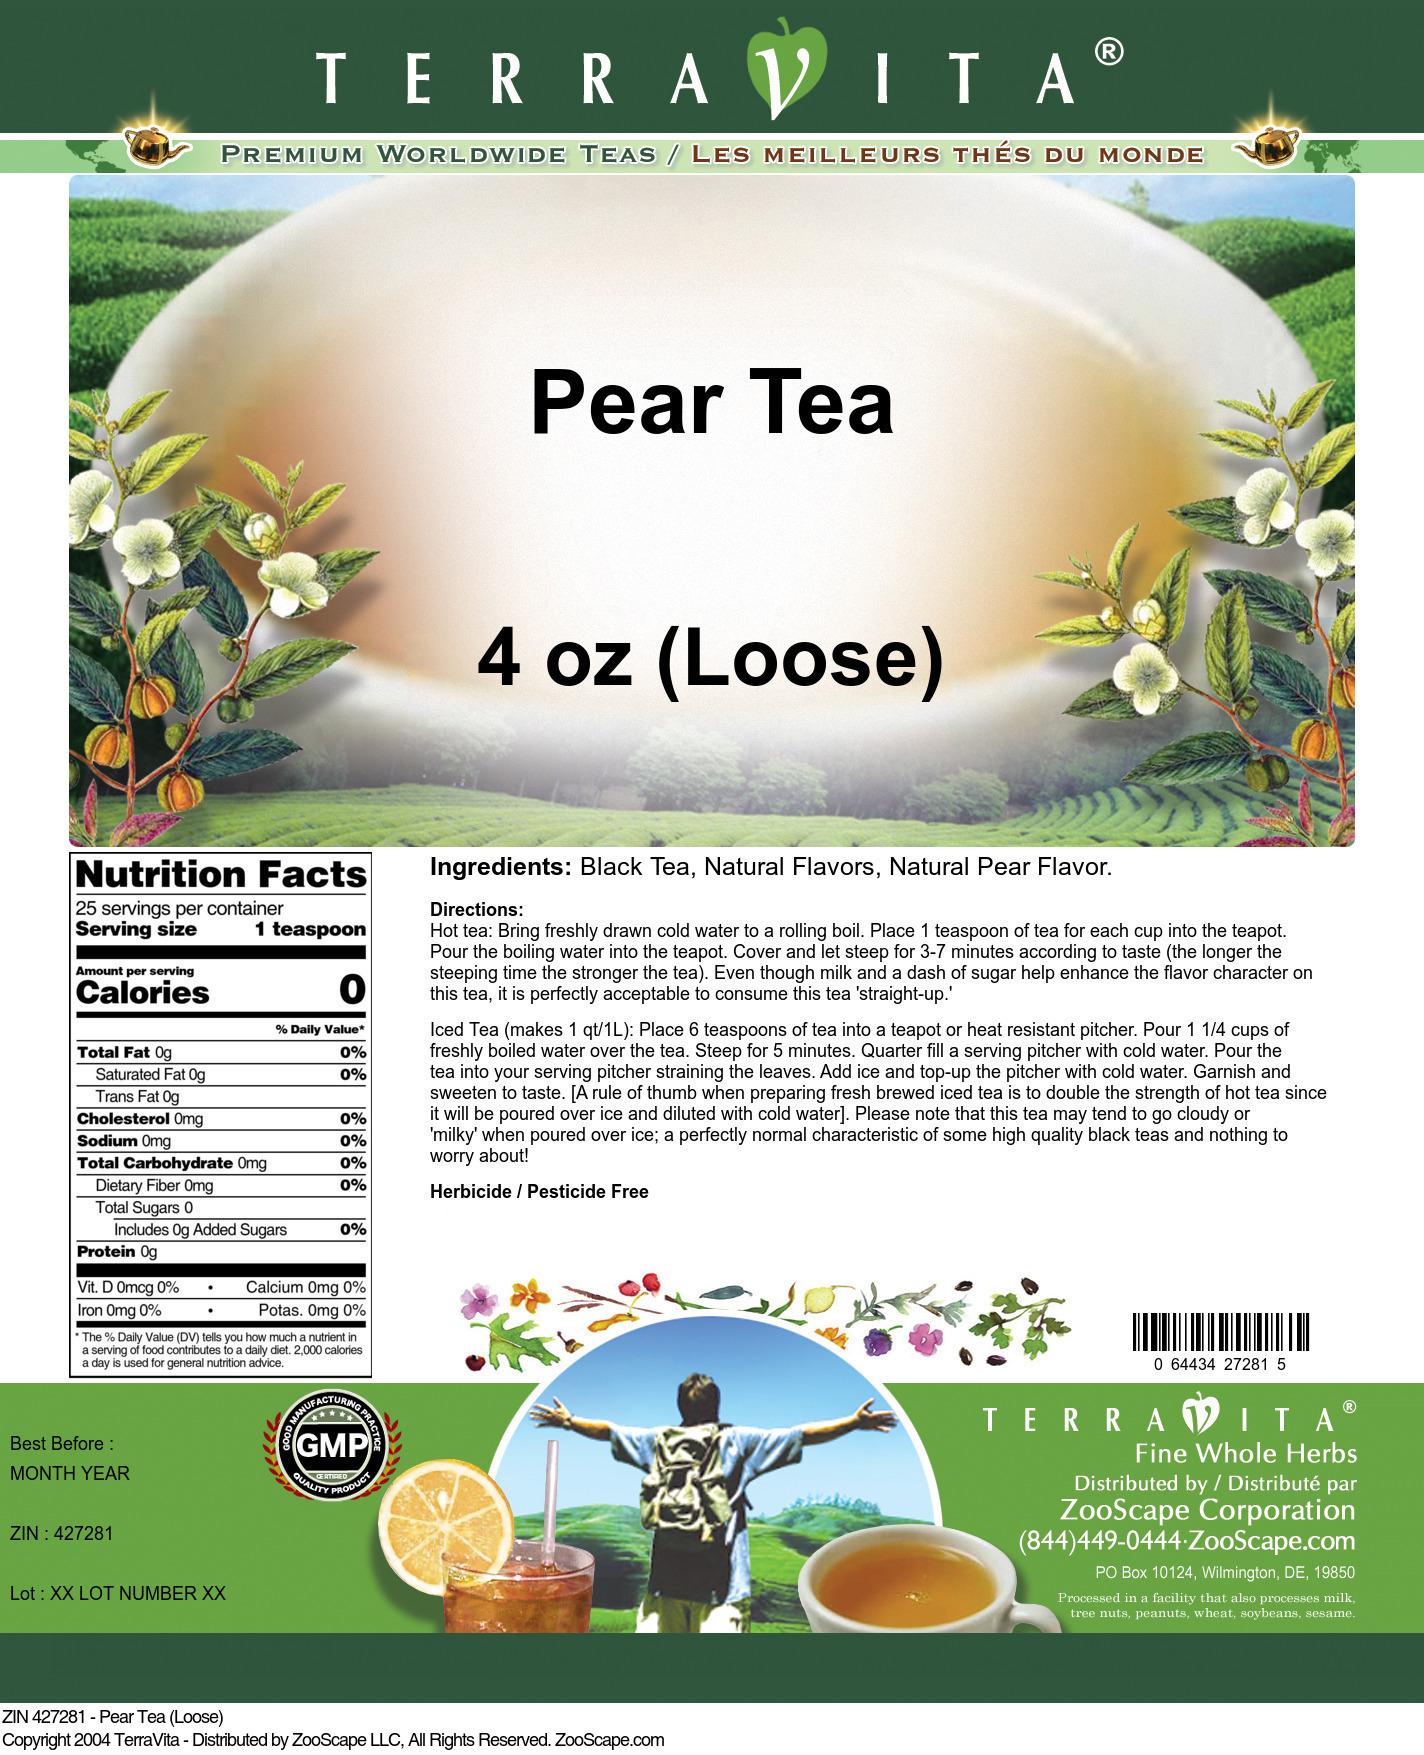 Pear Tea (Loose)